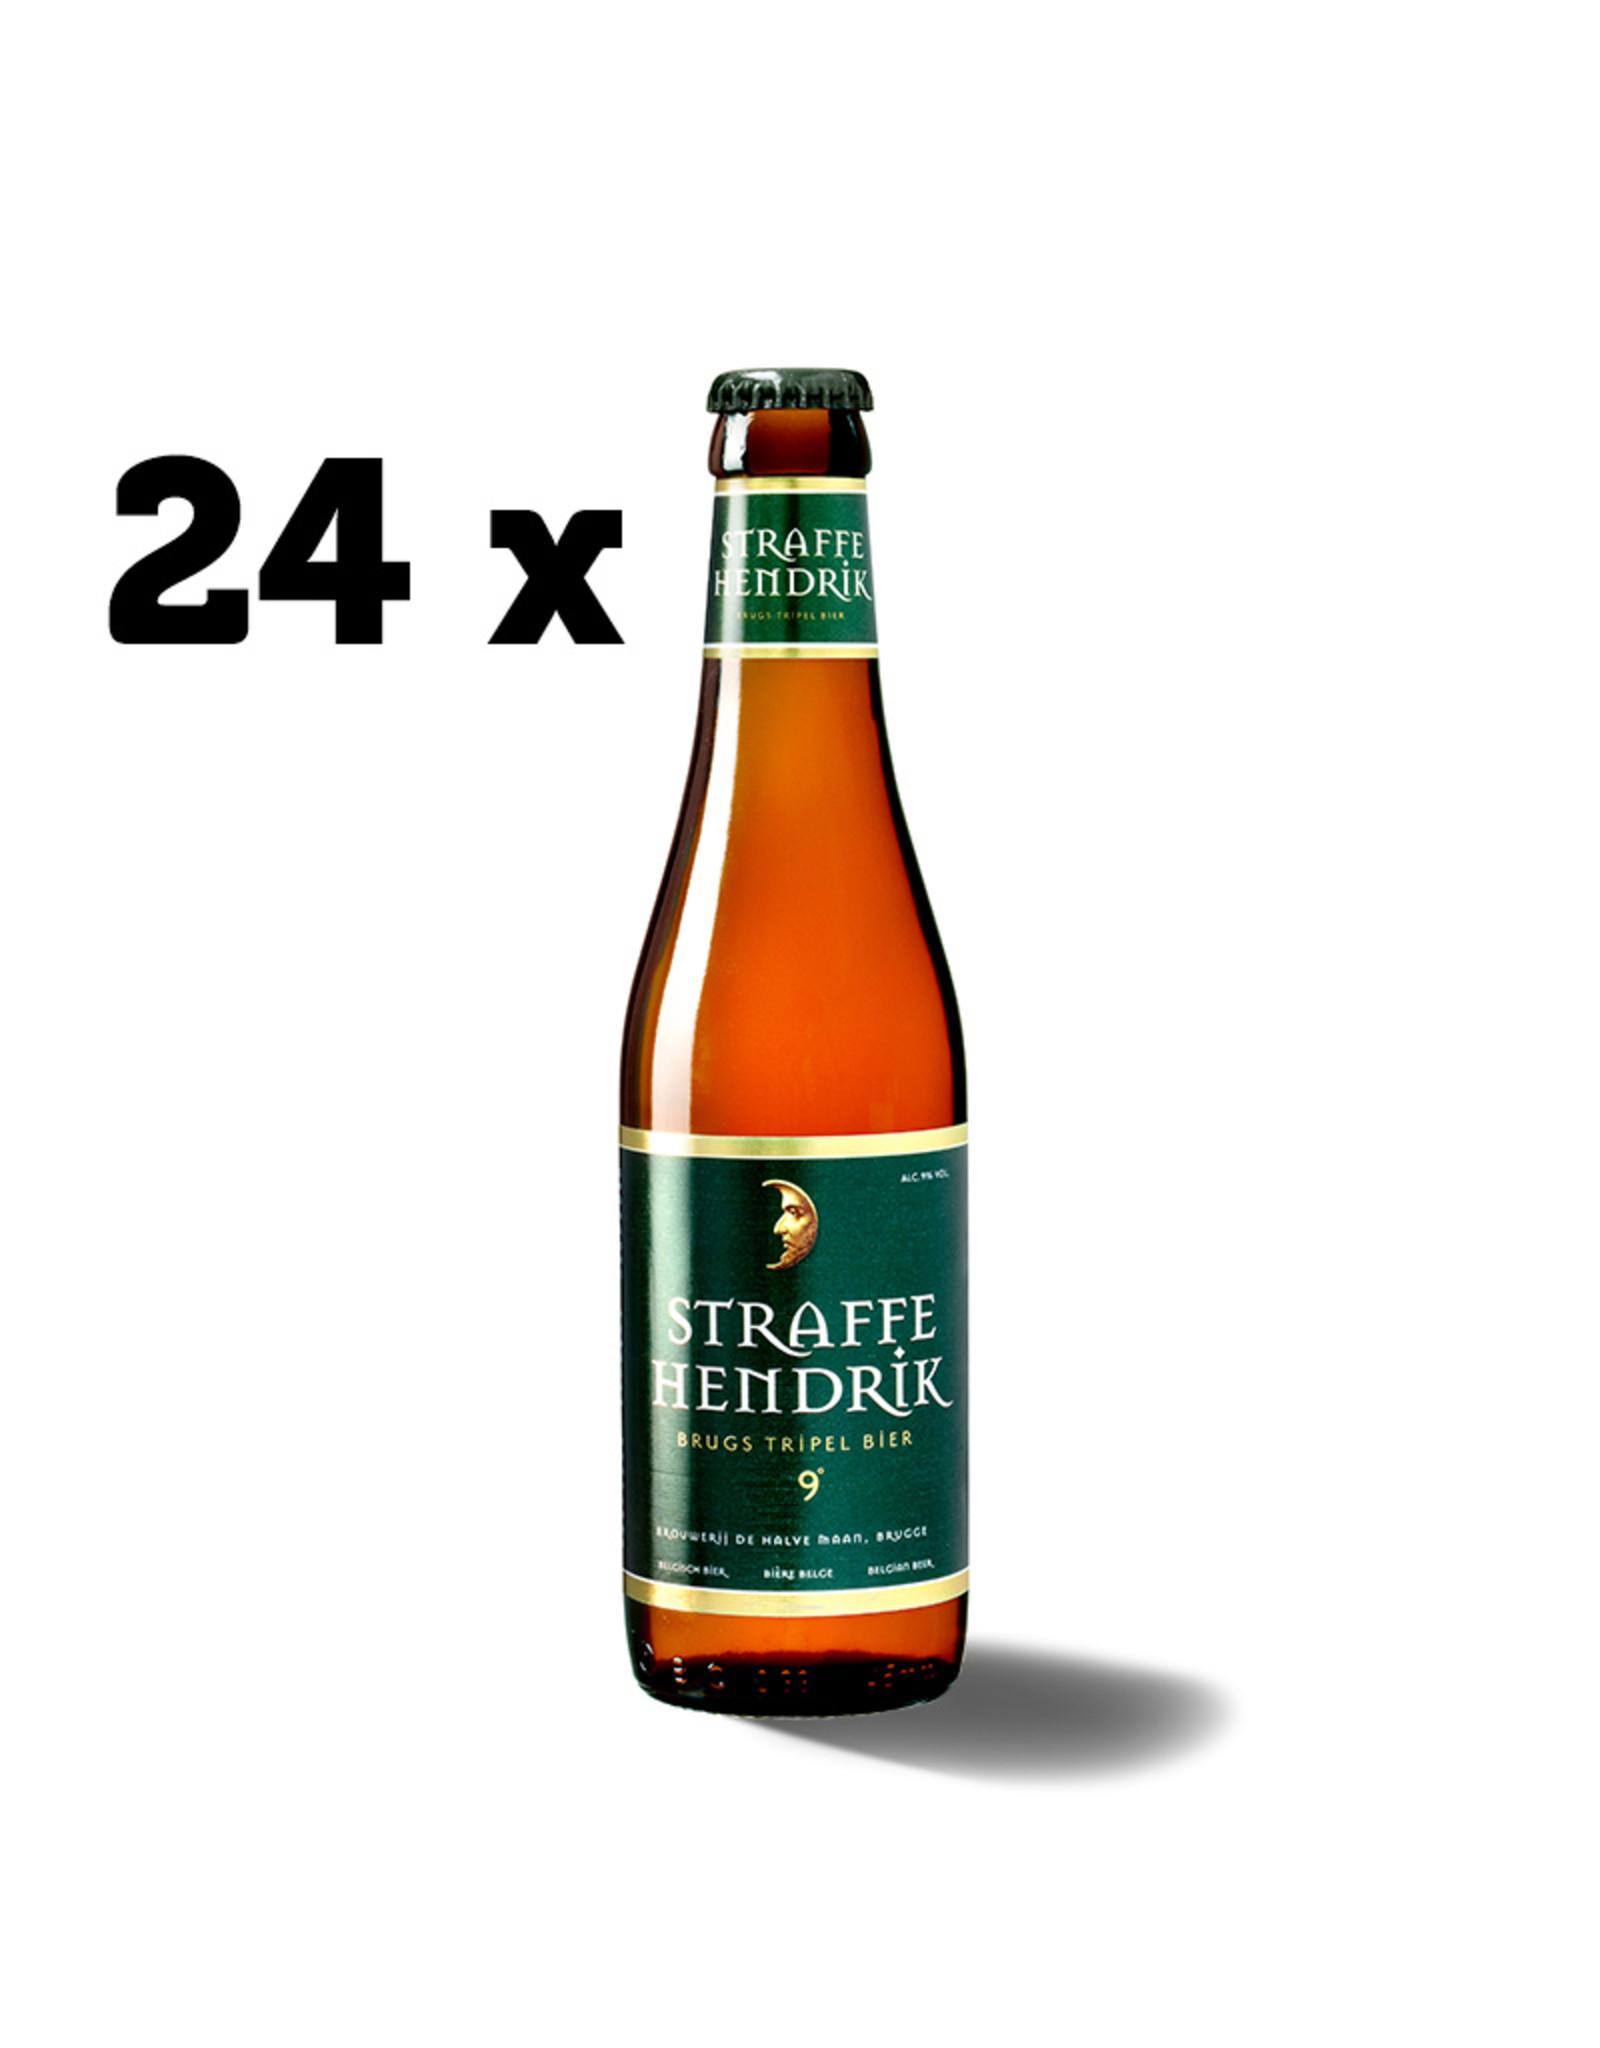 Straffe Hendrik Straffe Hendrik Tripel Doos 24 X 33 cl